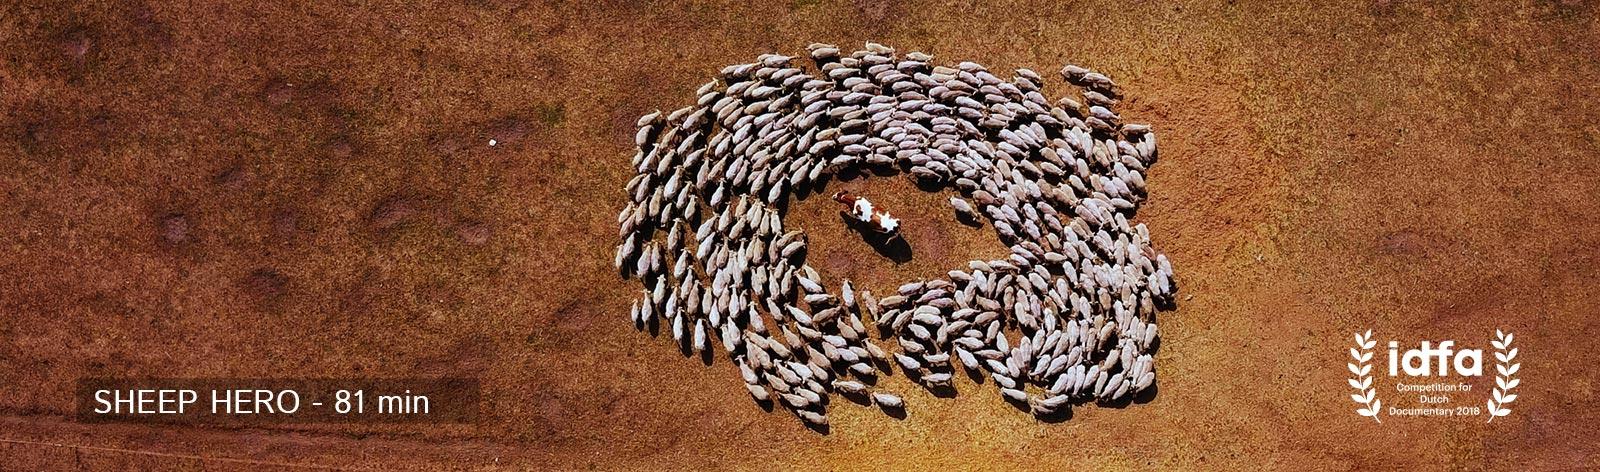 sheephero-scheep-cow-